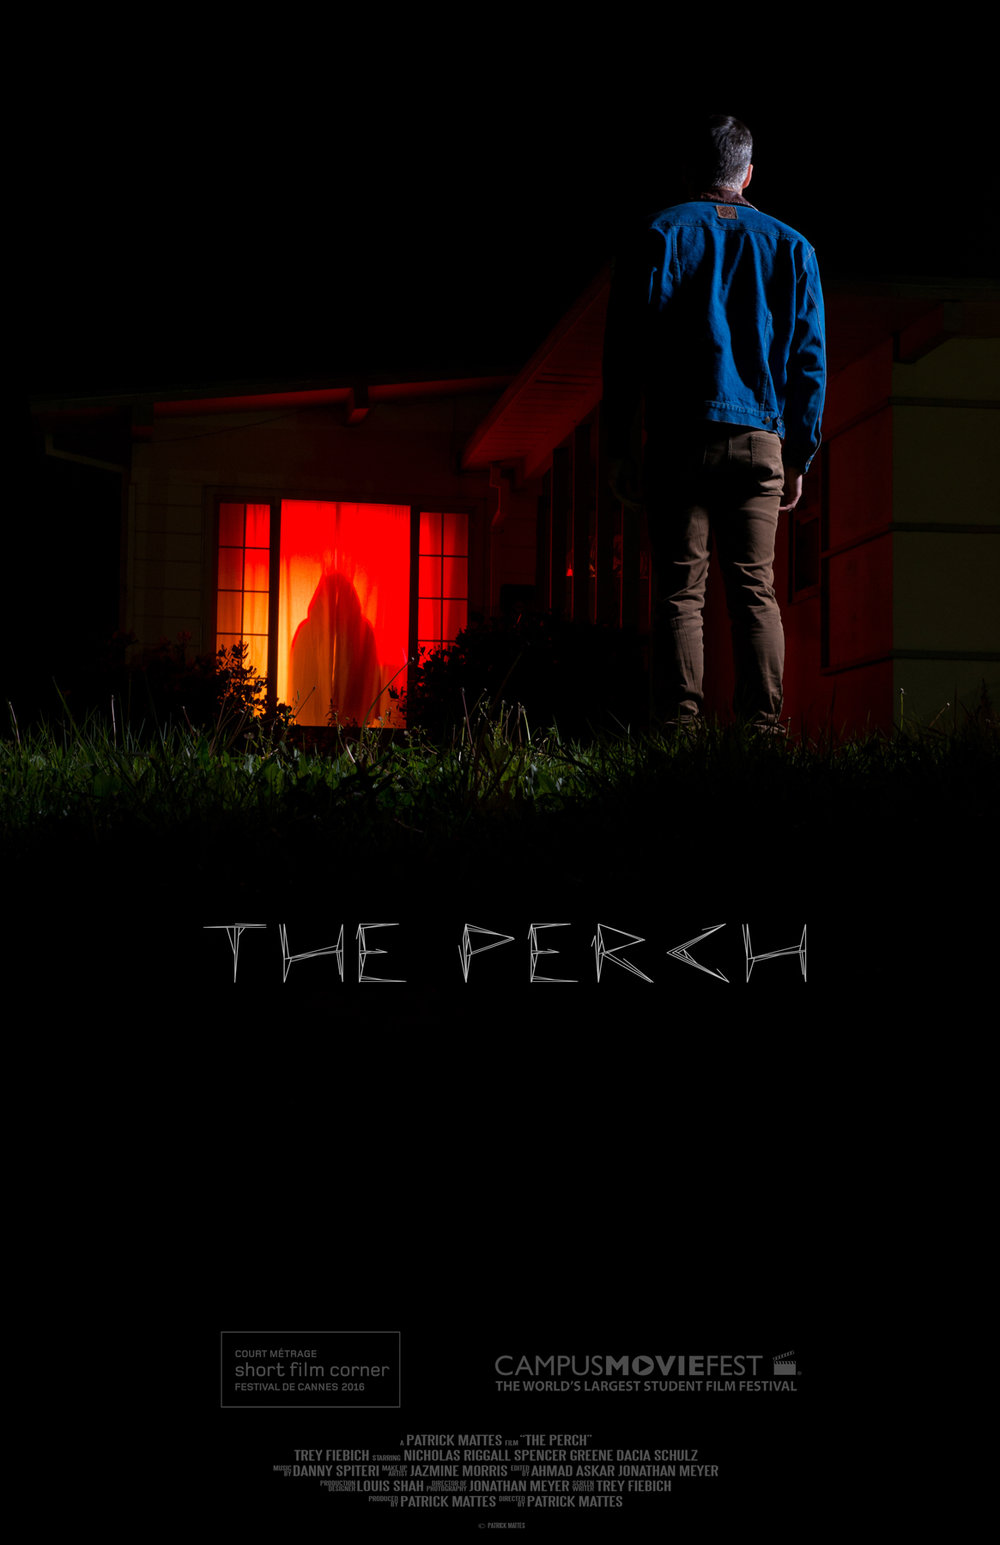 the-perch-poster-1117.jpg